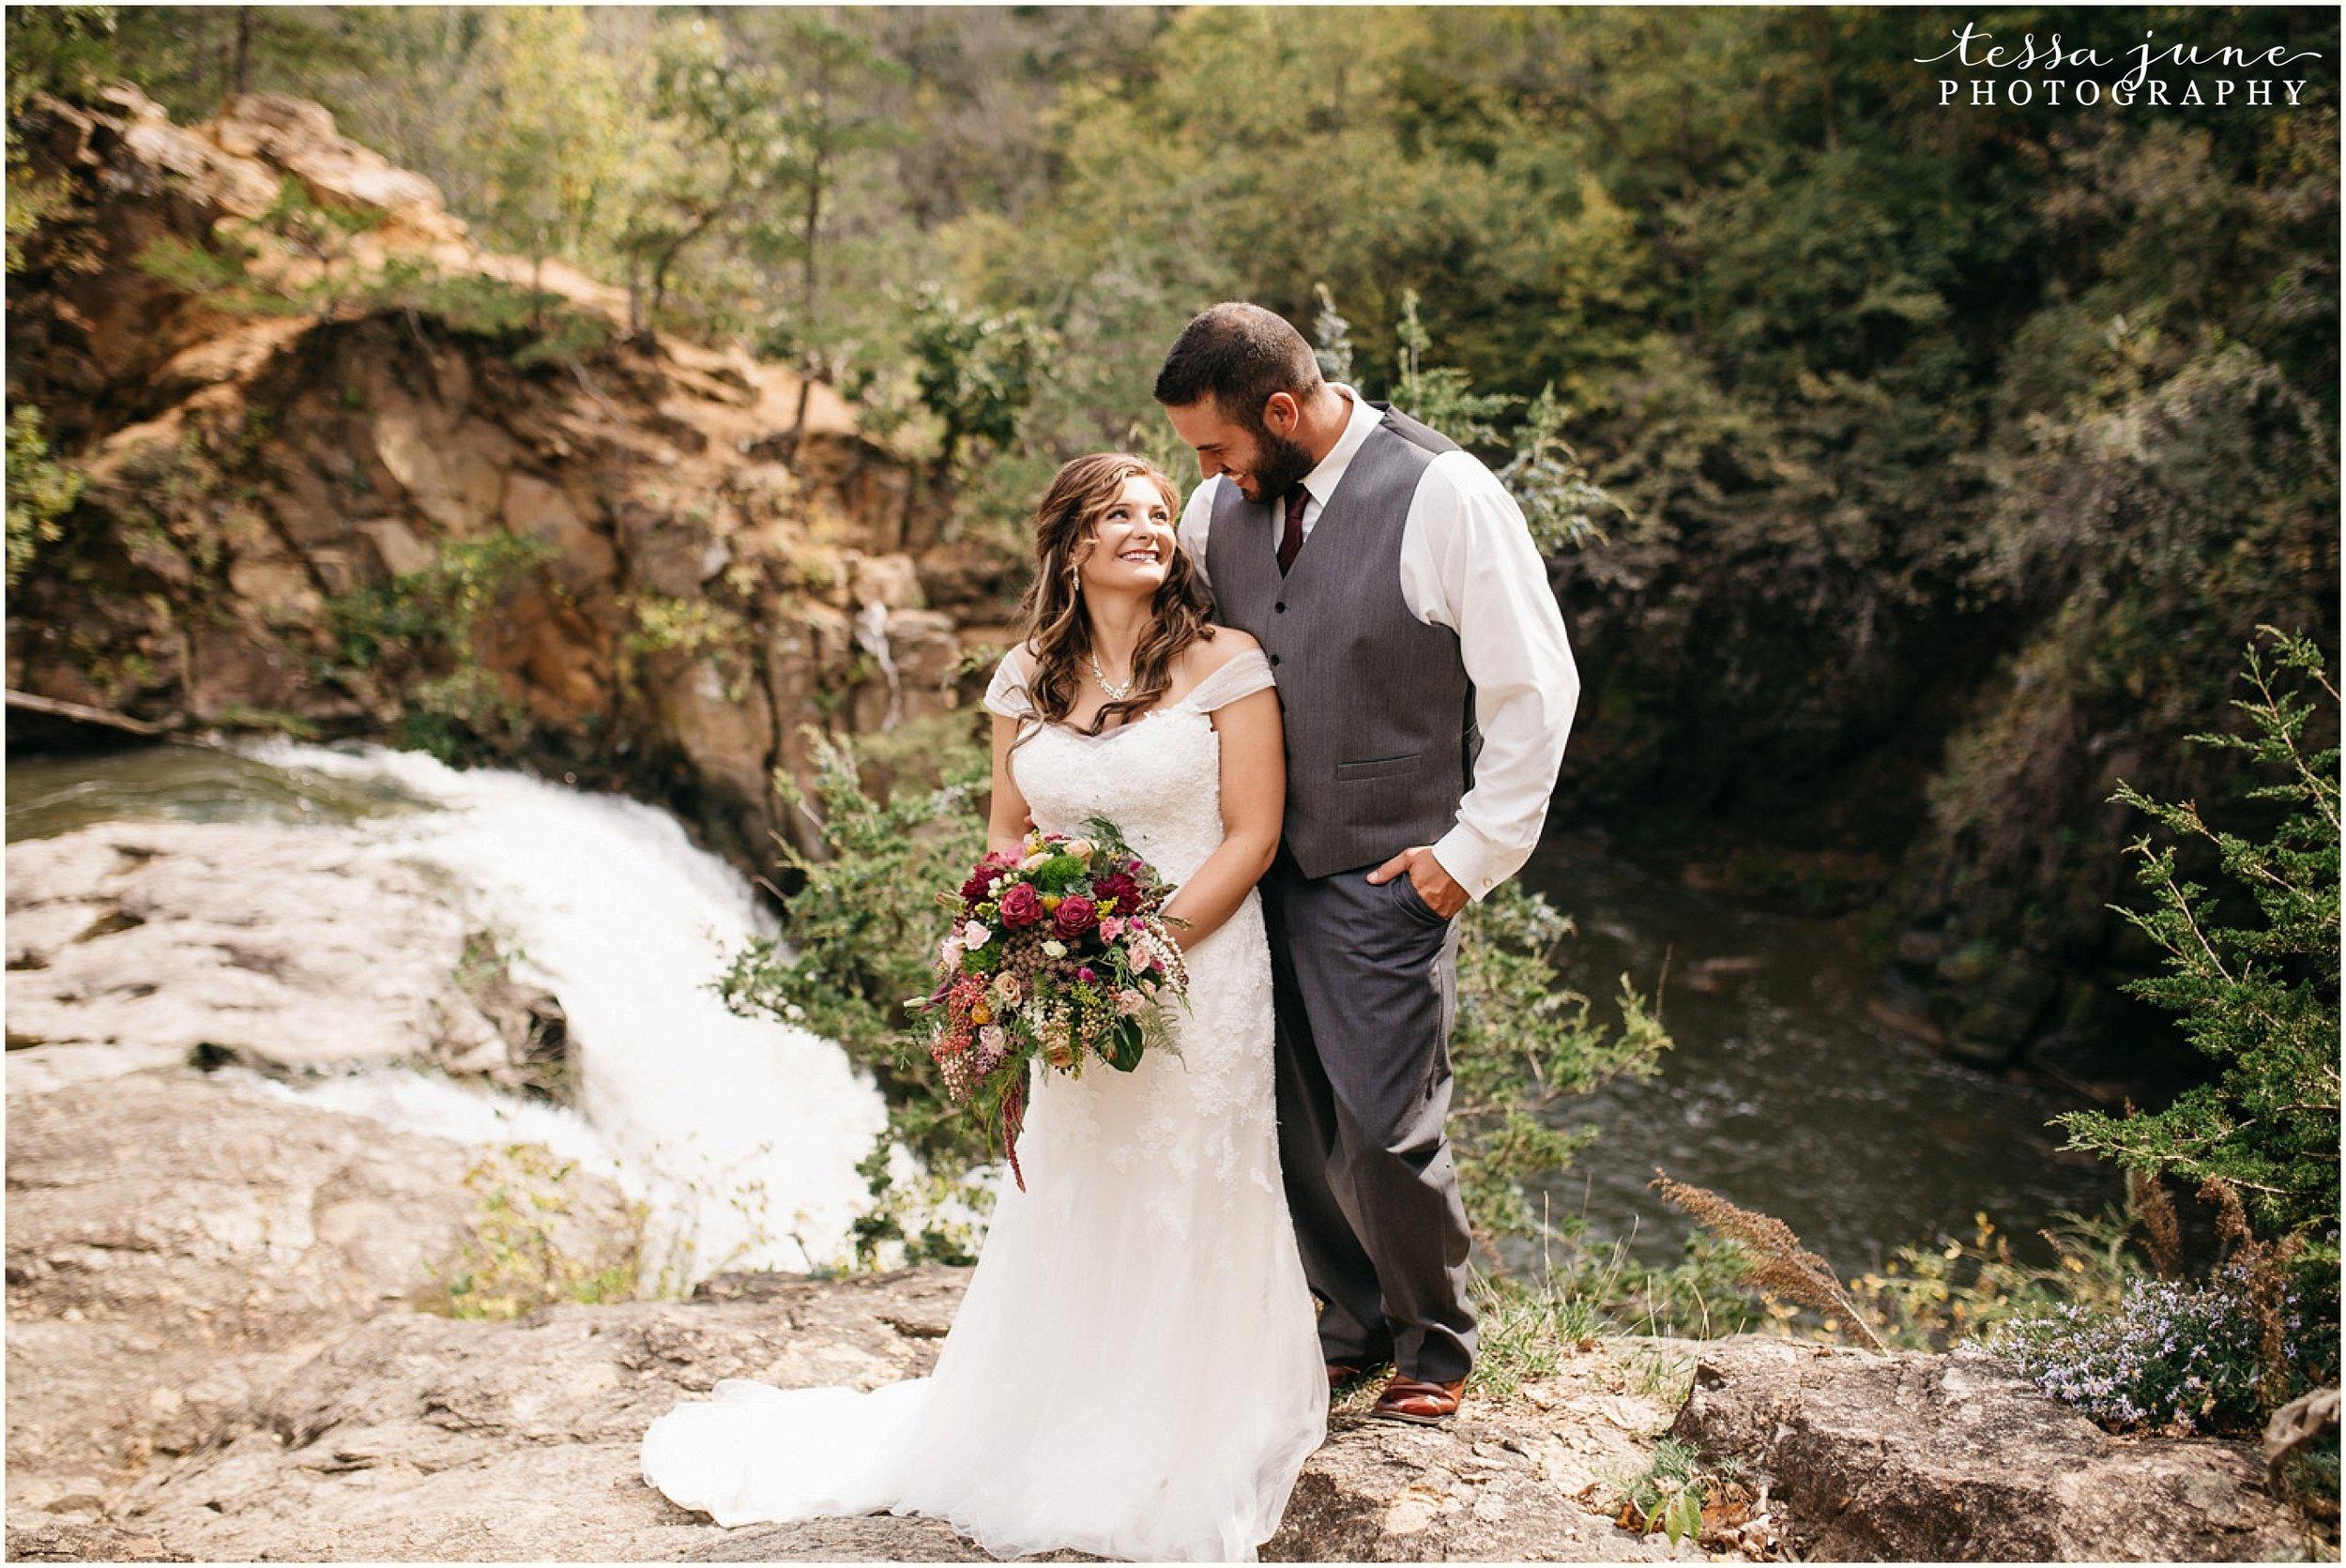 bohemian-minnesota-wedding-mismatched-bridesmaid-dresses-waterfall-st-cloud-tessa-june-photography-59.jpg